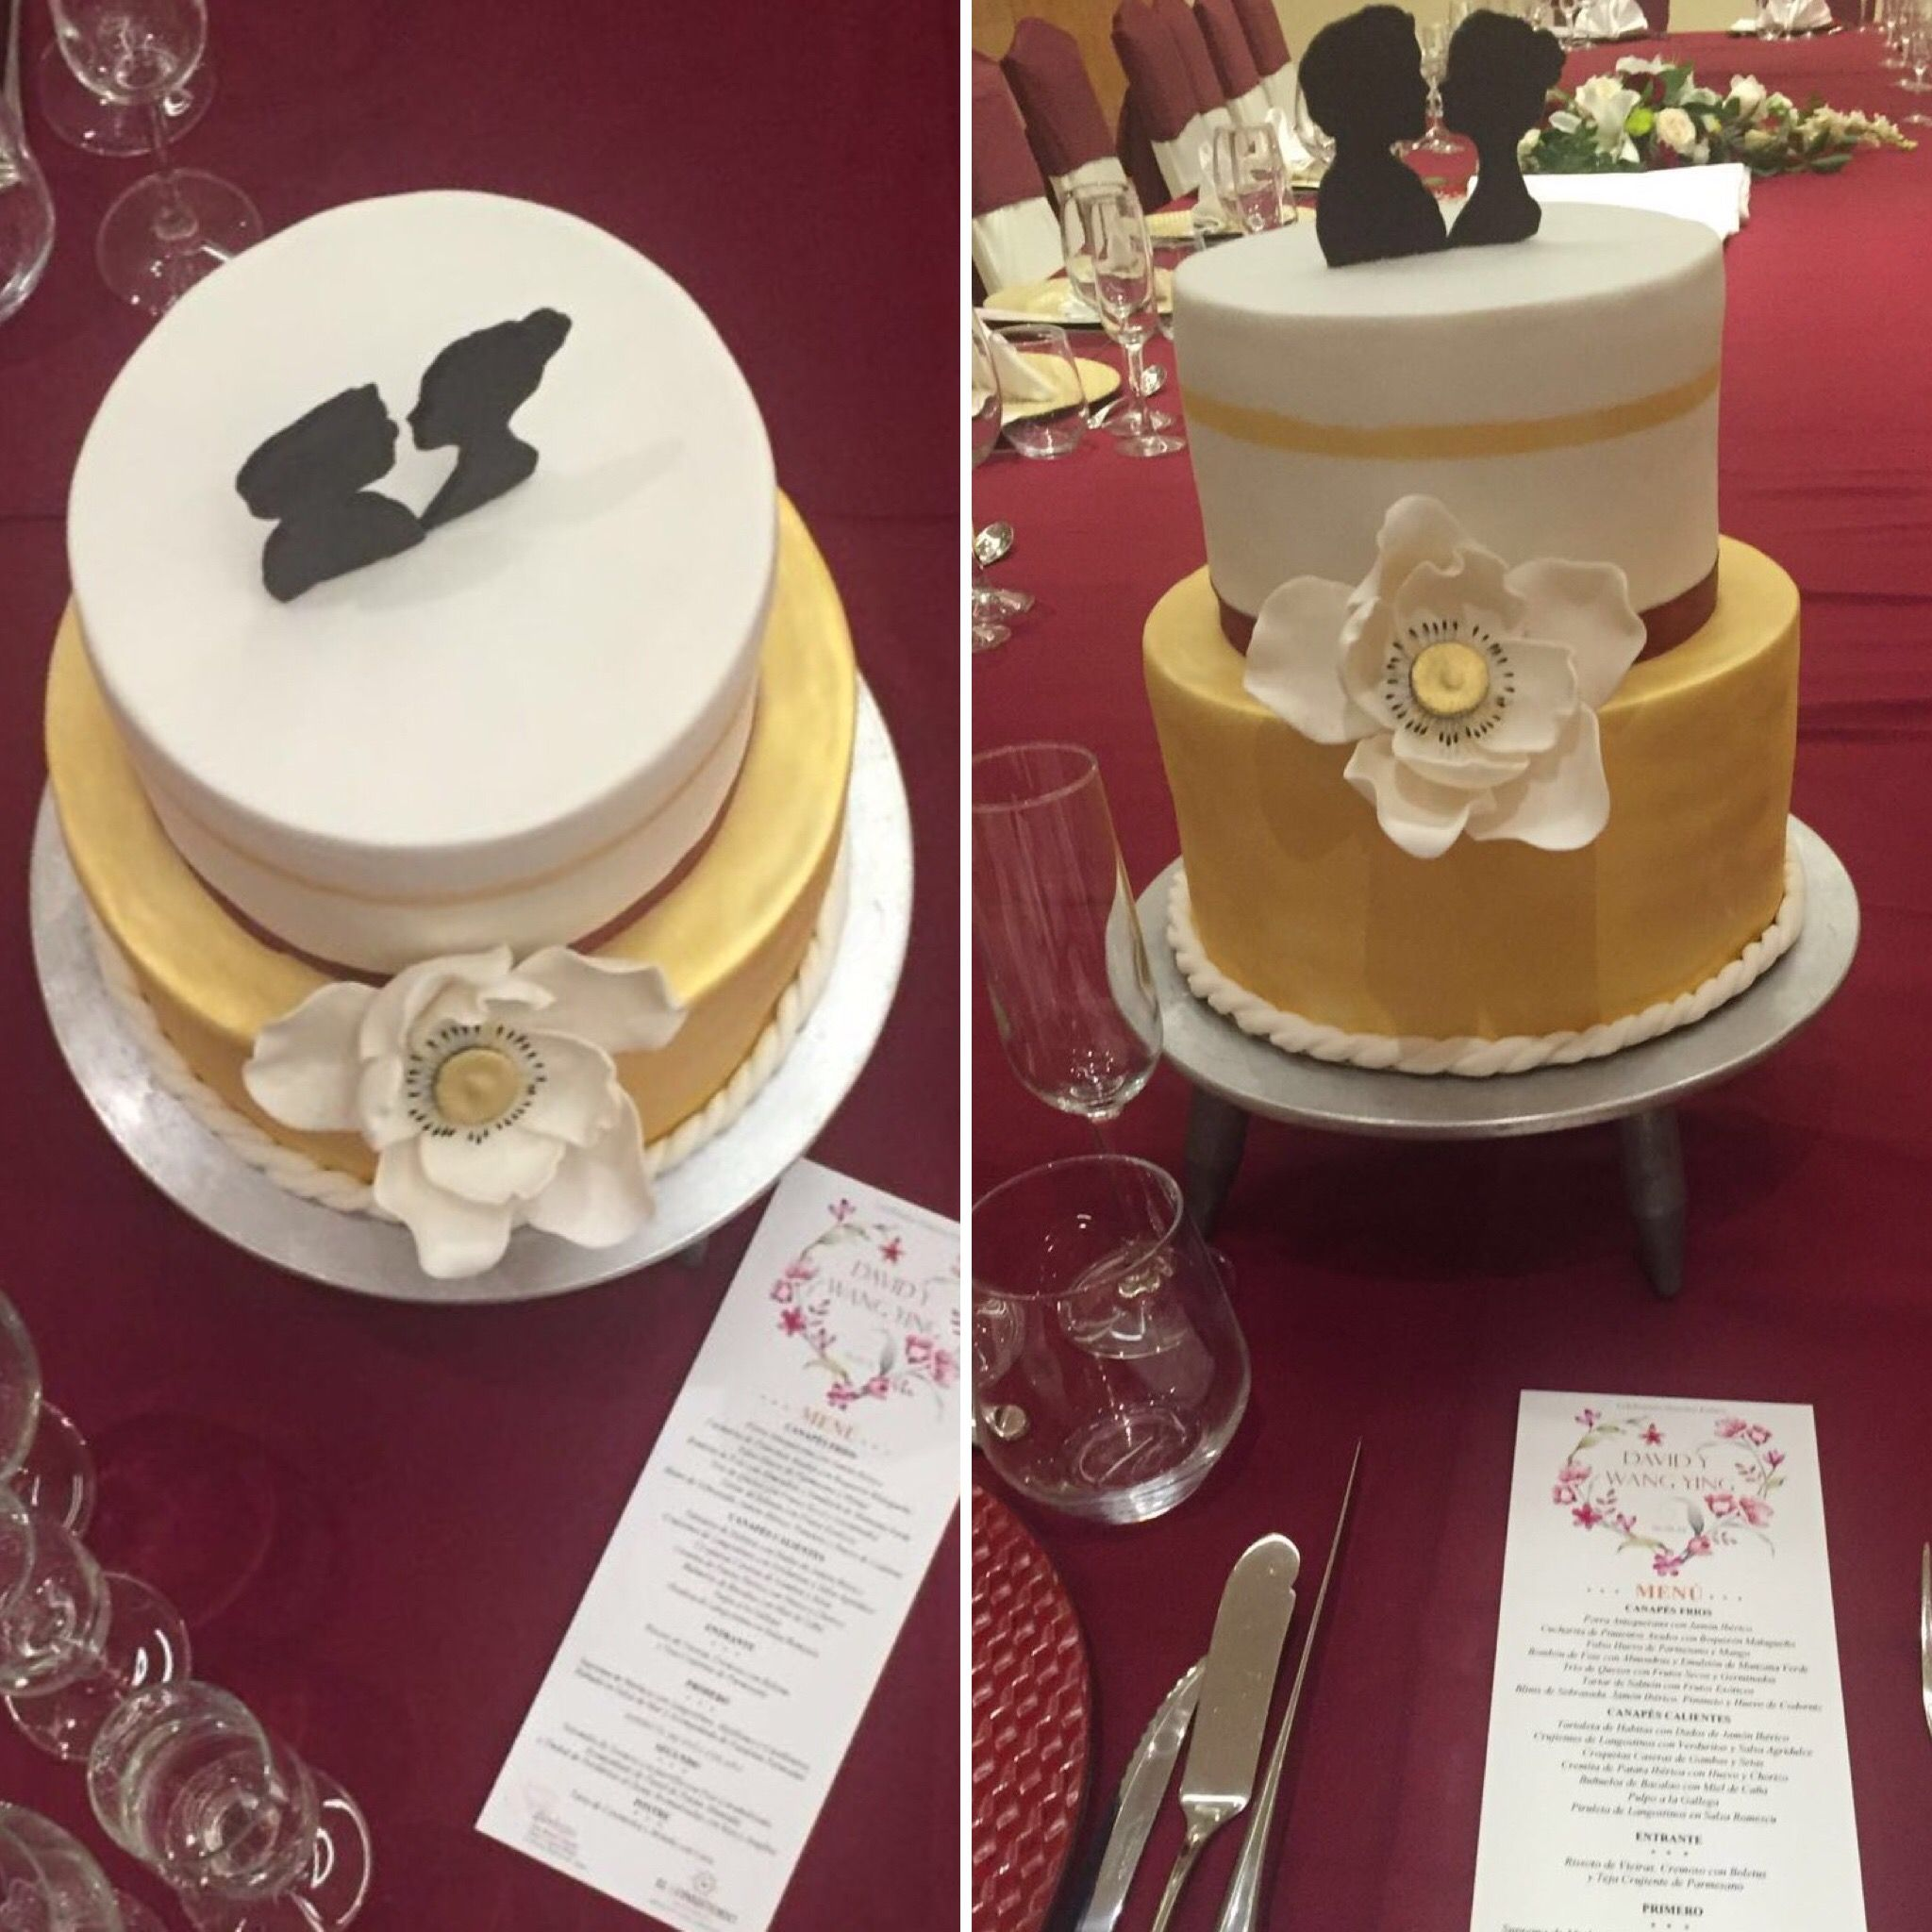 #cakedecor #fondant #malaga #eventos #bautizo #comunion #bodas #cumpleaños #tartaevento #tartasbonitas #reposteriacreativa #aniversario #bodasdeoro